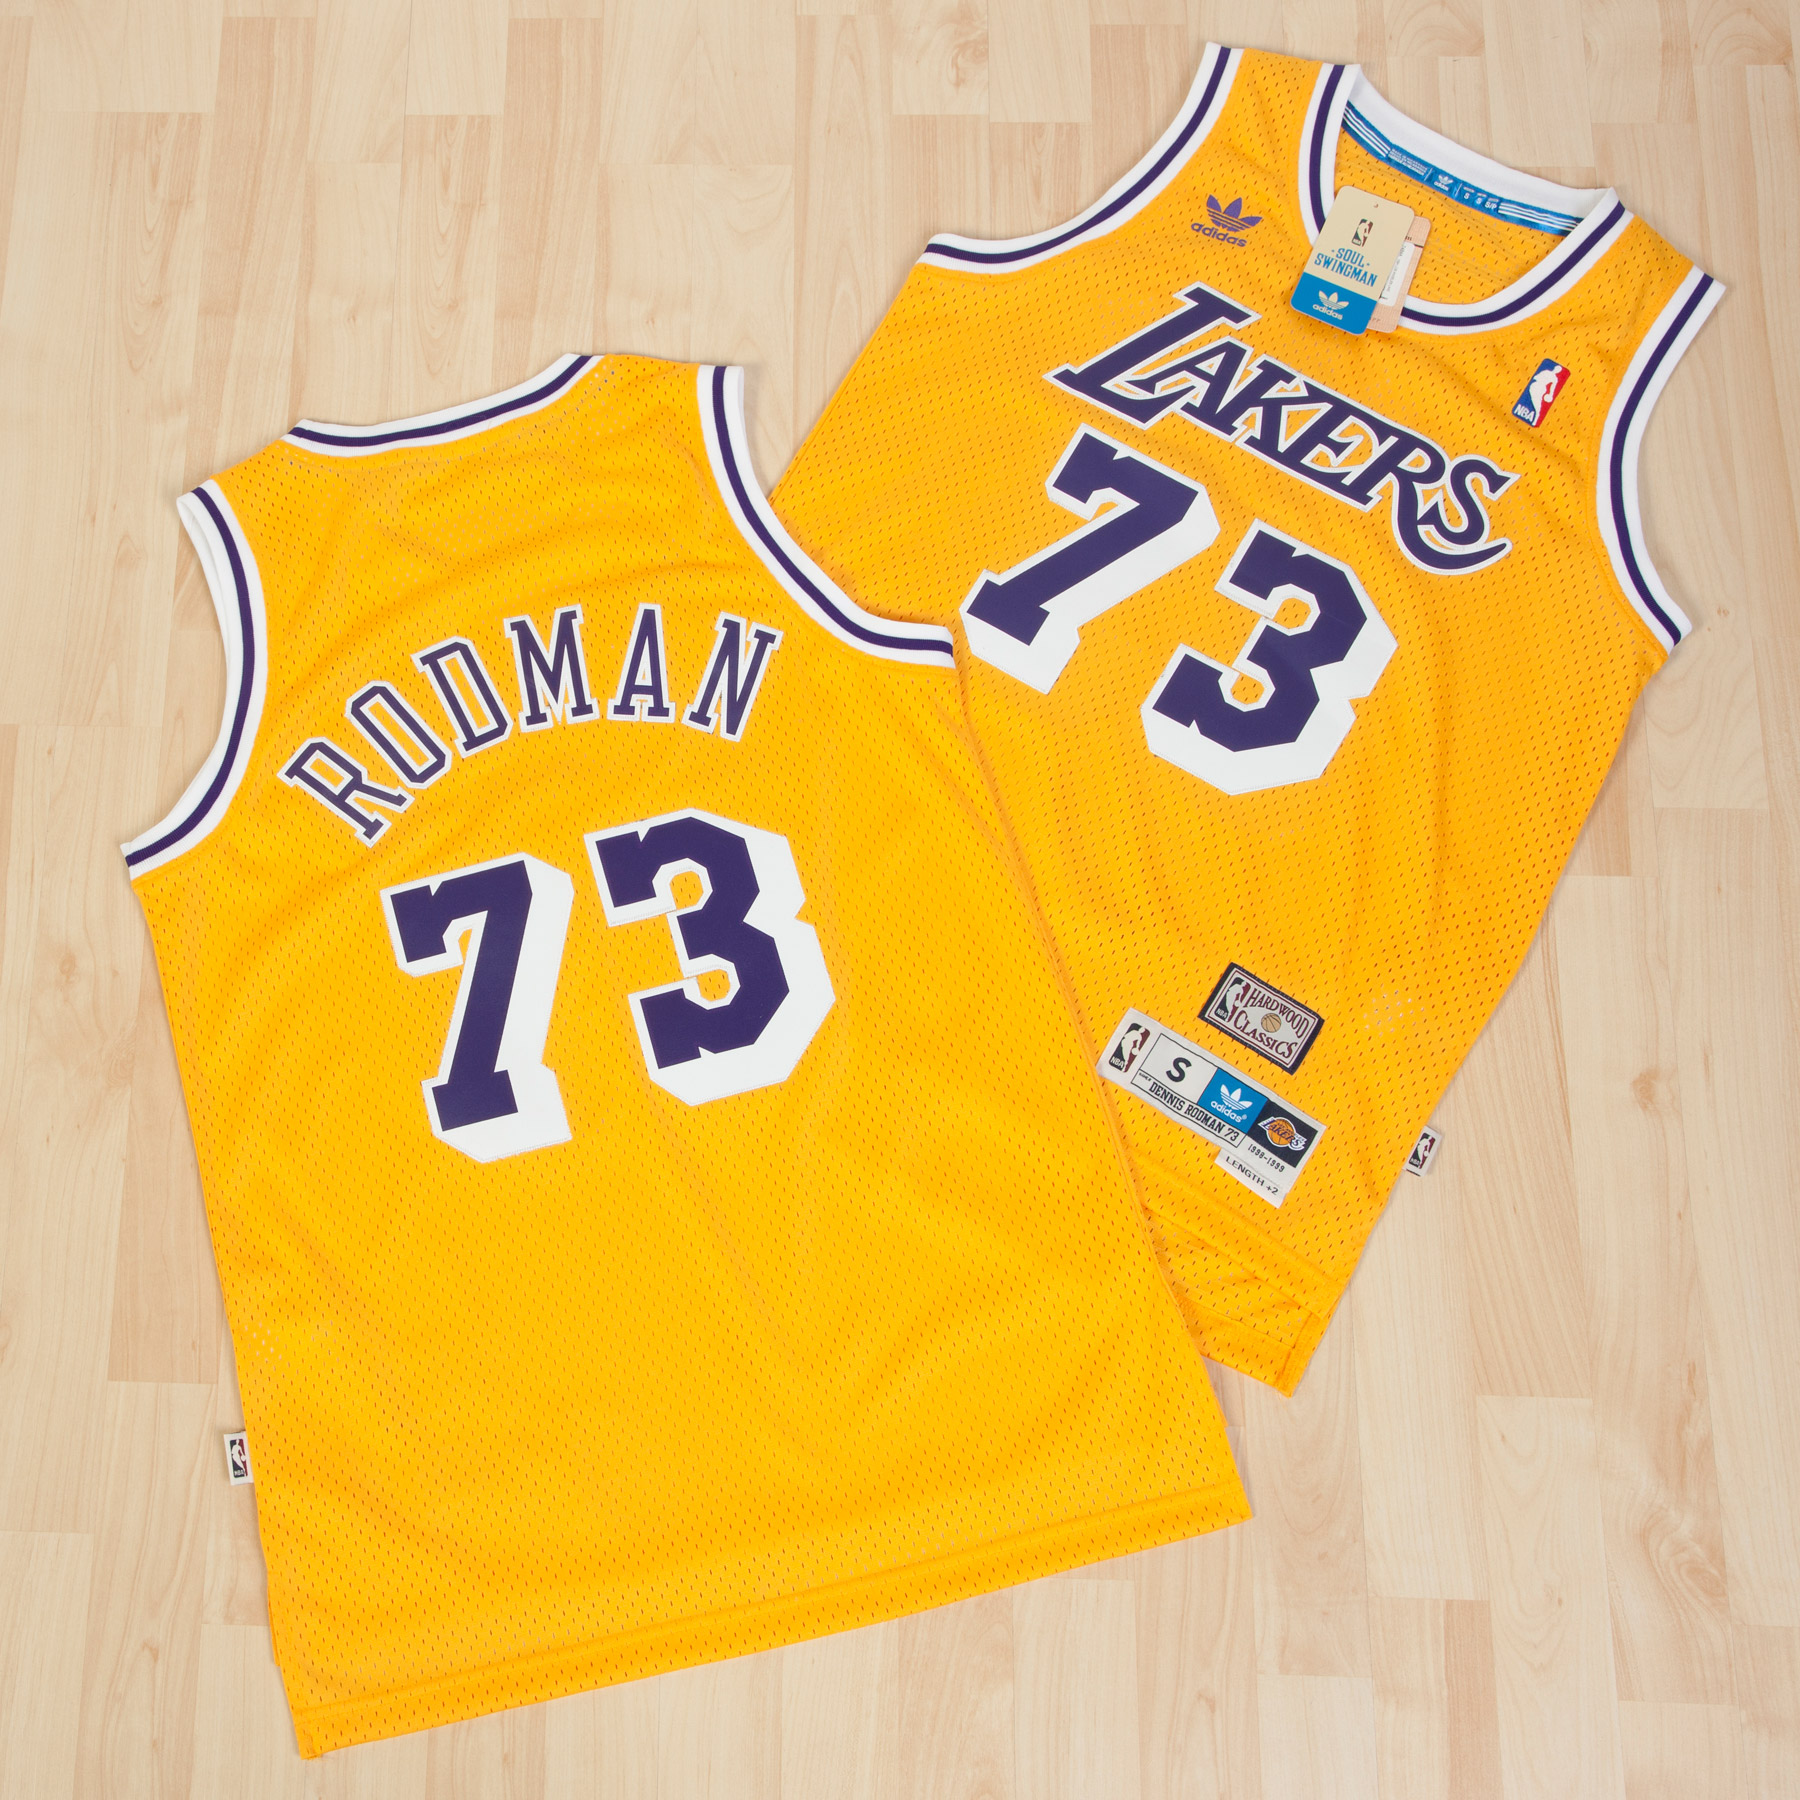 Los Angeles Lakers Home Soul Swingman Jersey - Dennis Rodman - Mens